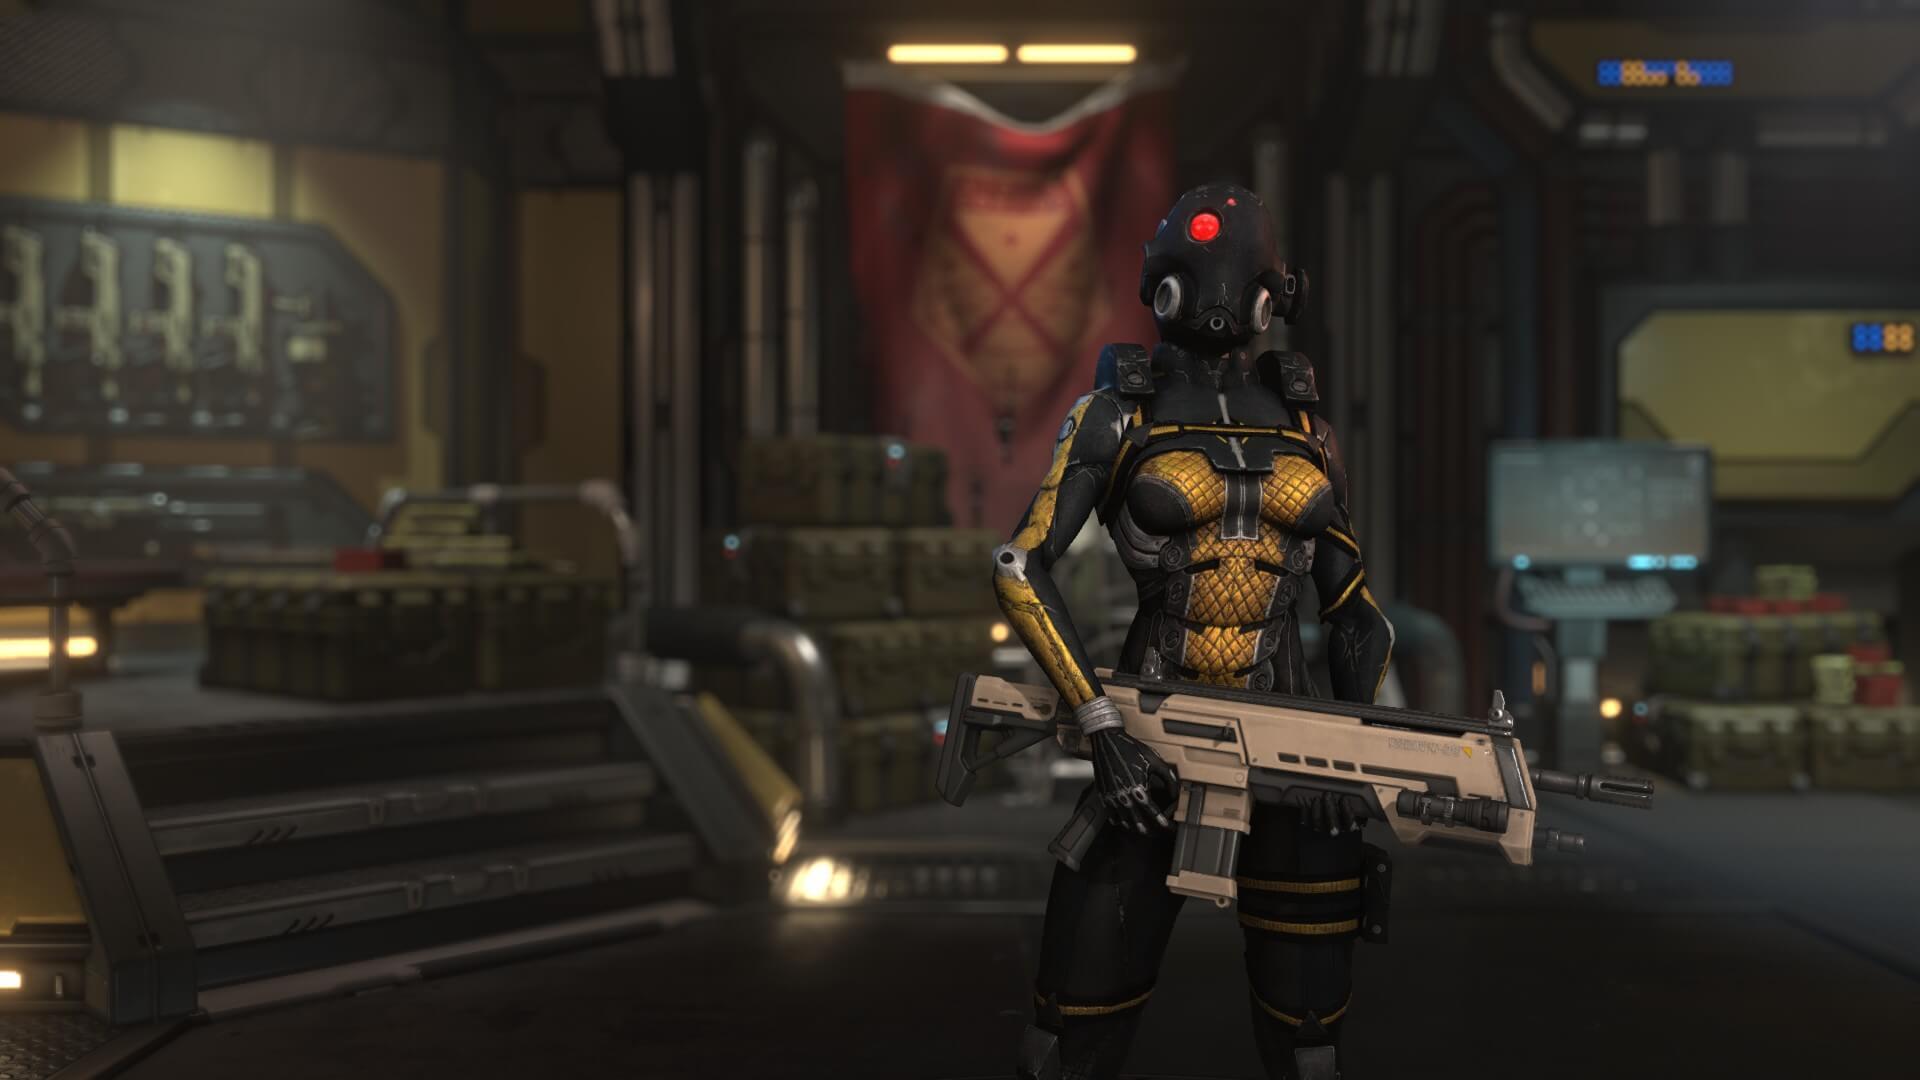 XCOM 2 - Пак Цербера из Mass Effect для WOTC – Мод-сообщество TBMods.ru